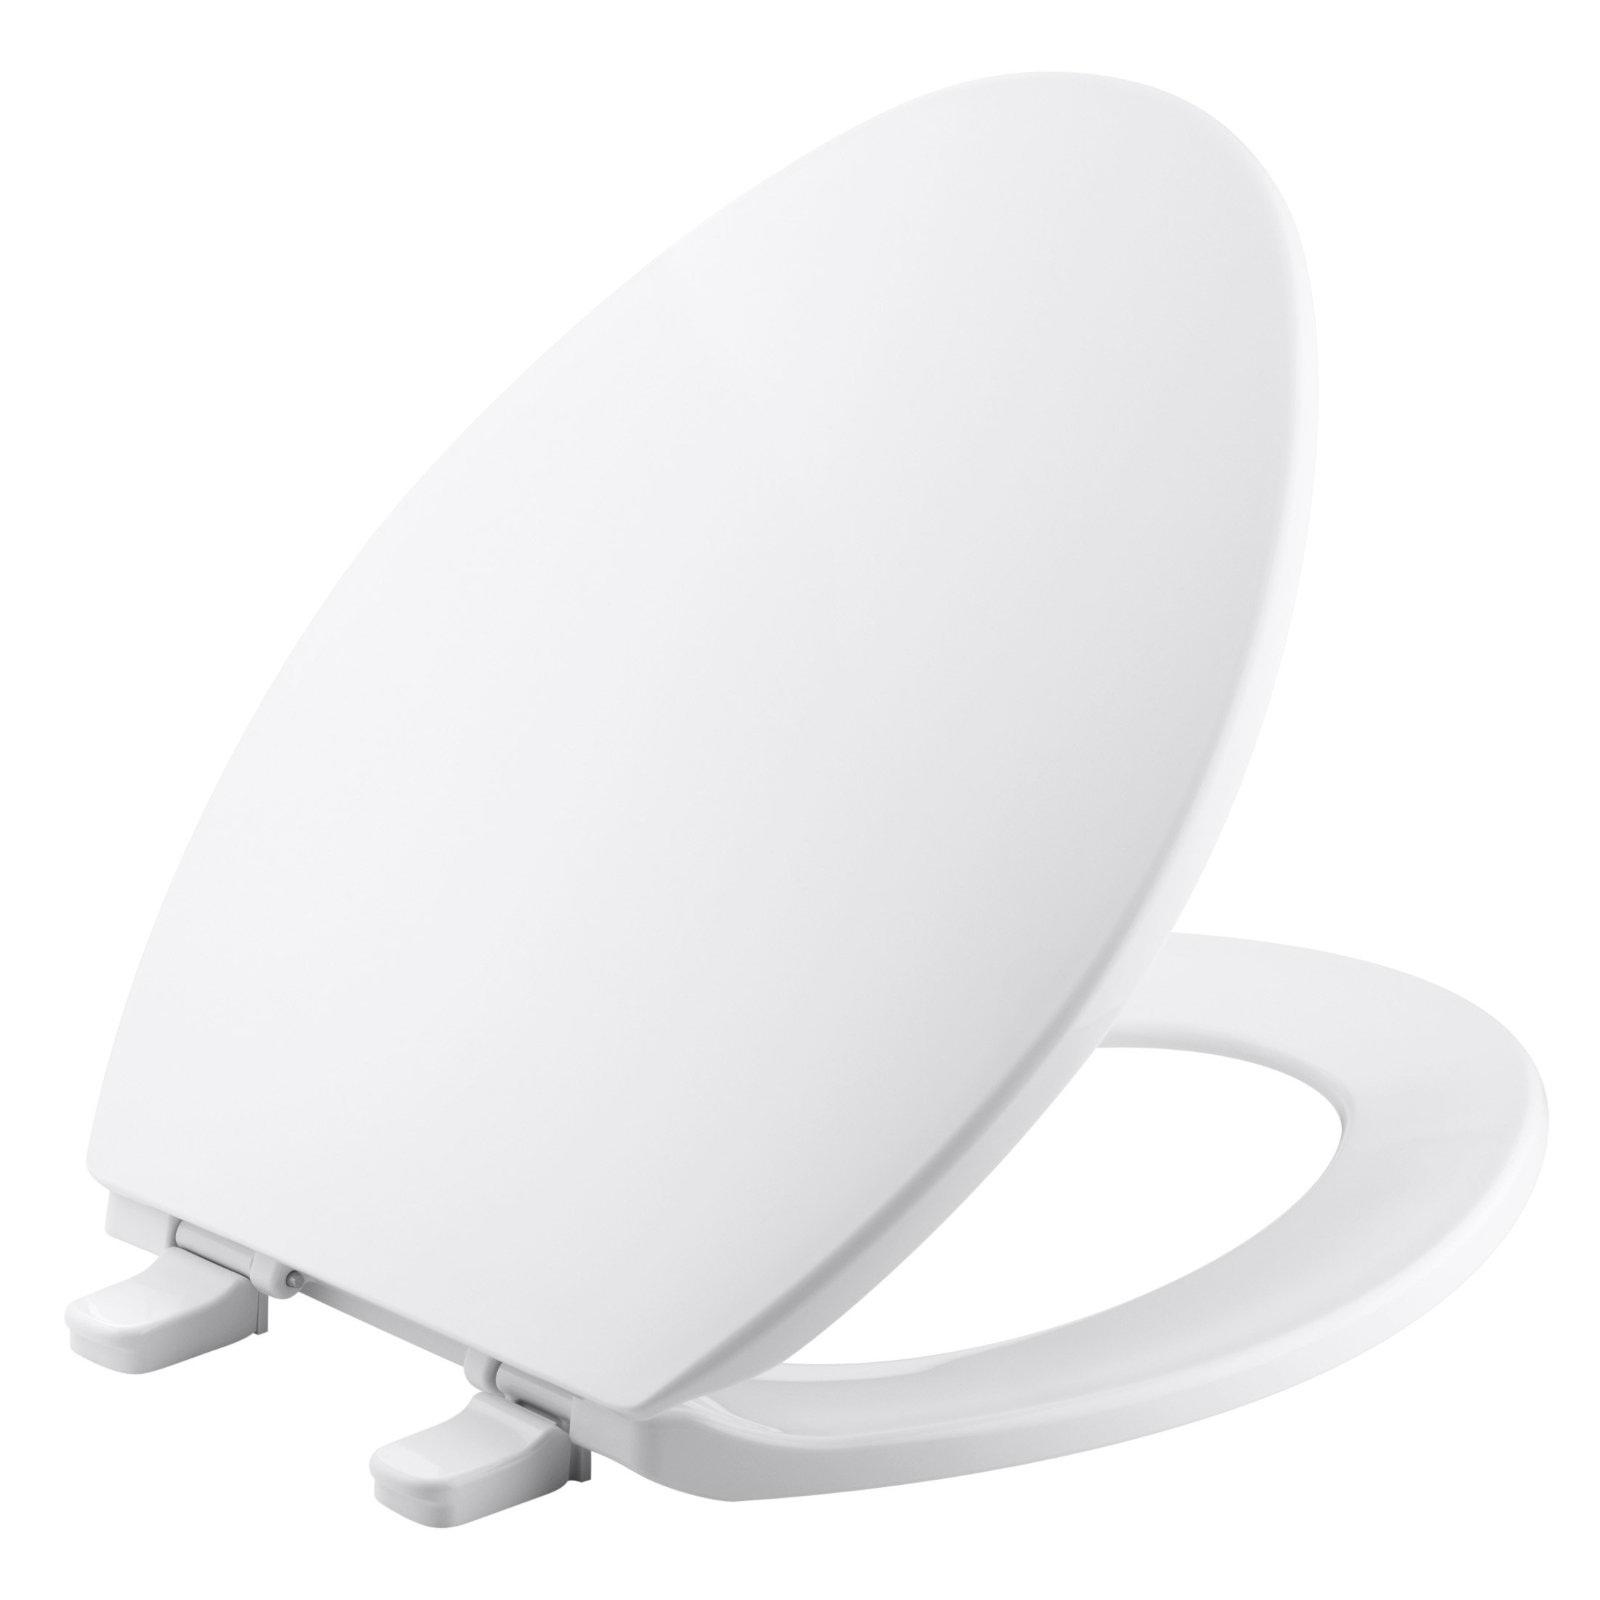 Asiento para inodoro elongado modelo Brevia de plástico blanco KOHLER